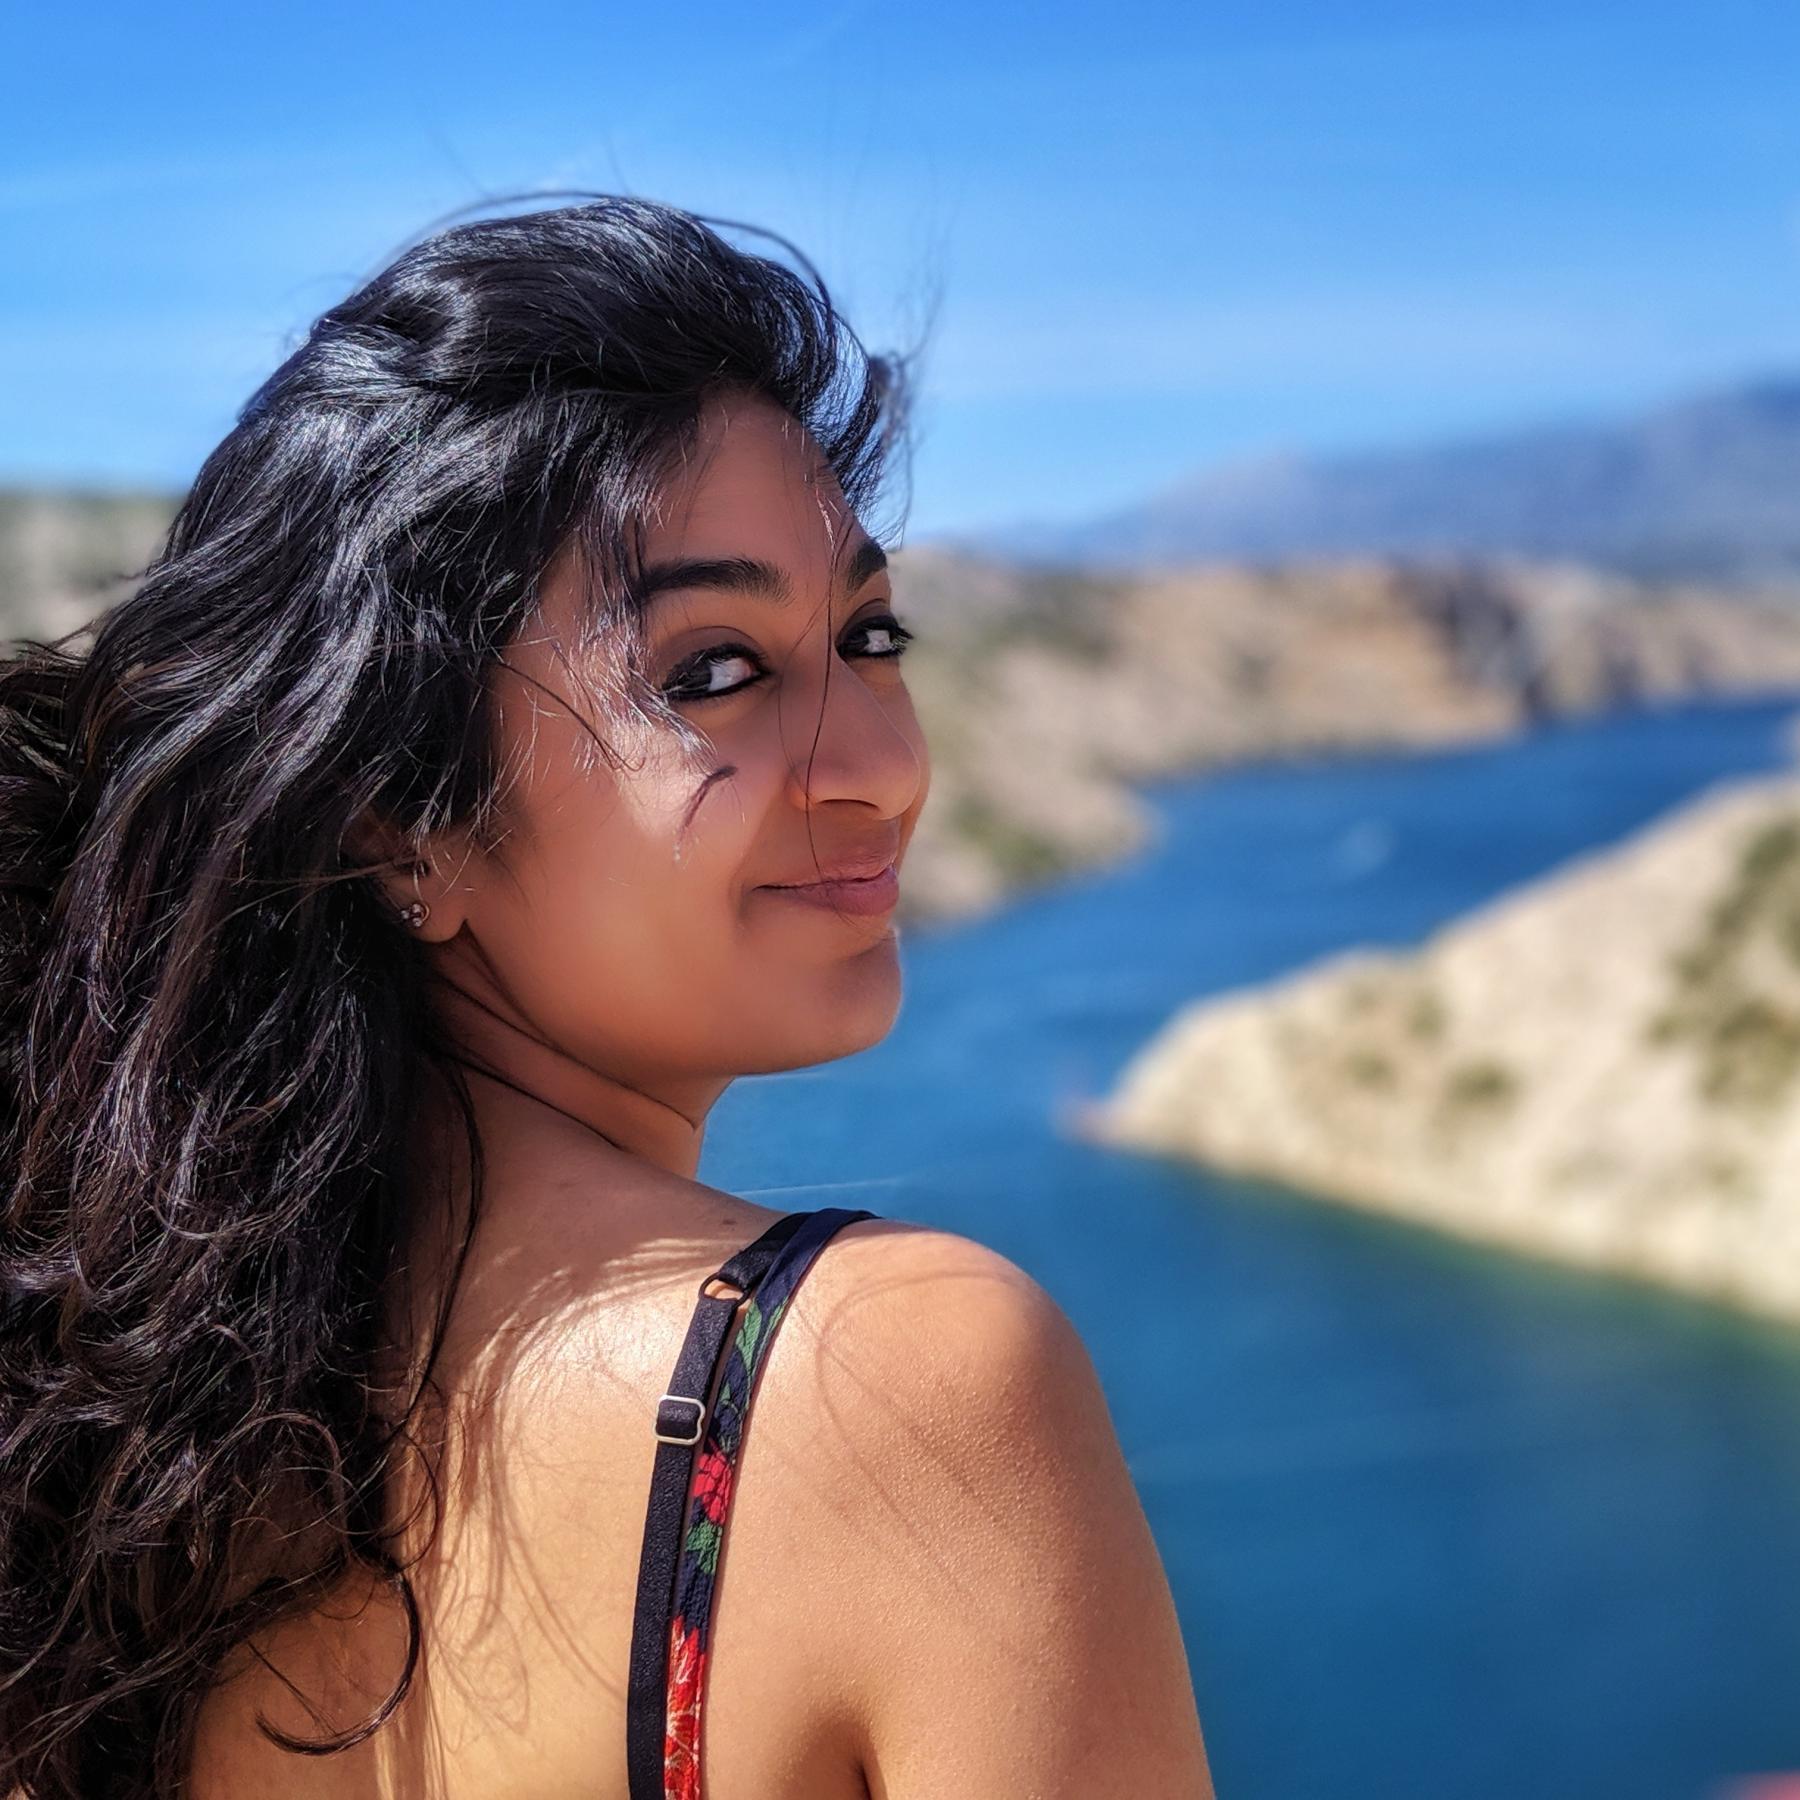 a girl smiling instagram influencer